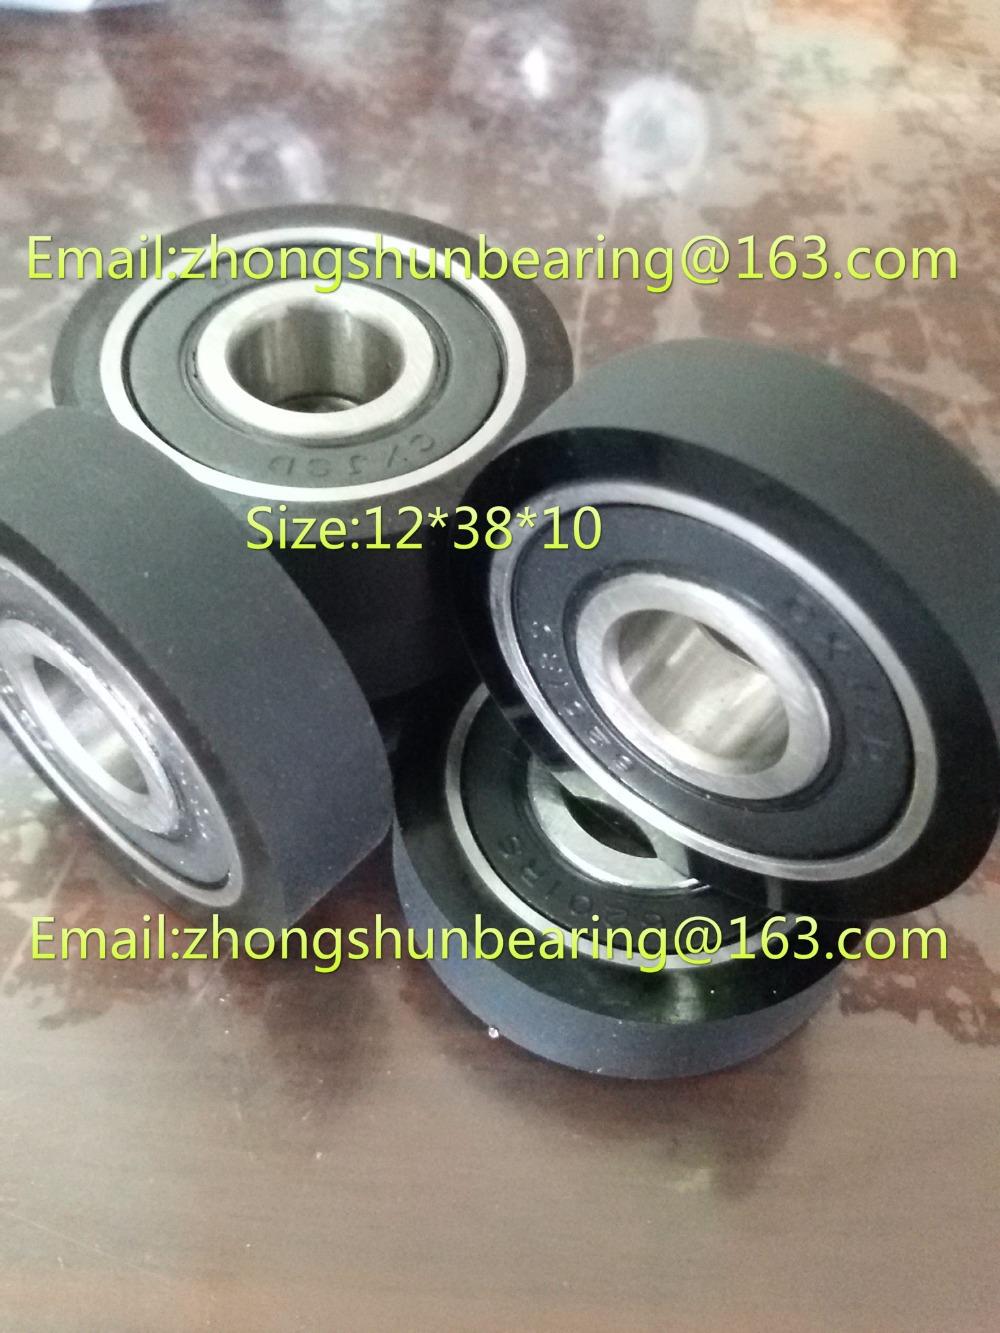 Polyurethane bearing62012rs using pad printer ,PU Bearing,wear-resisting,Shock absorption,bearing size:12*38*10(China (Mainland))